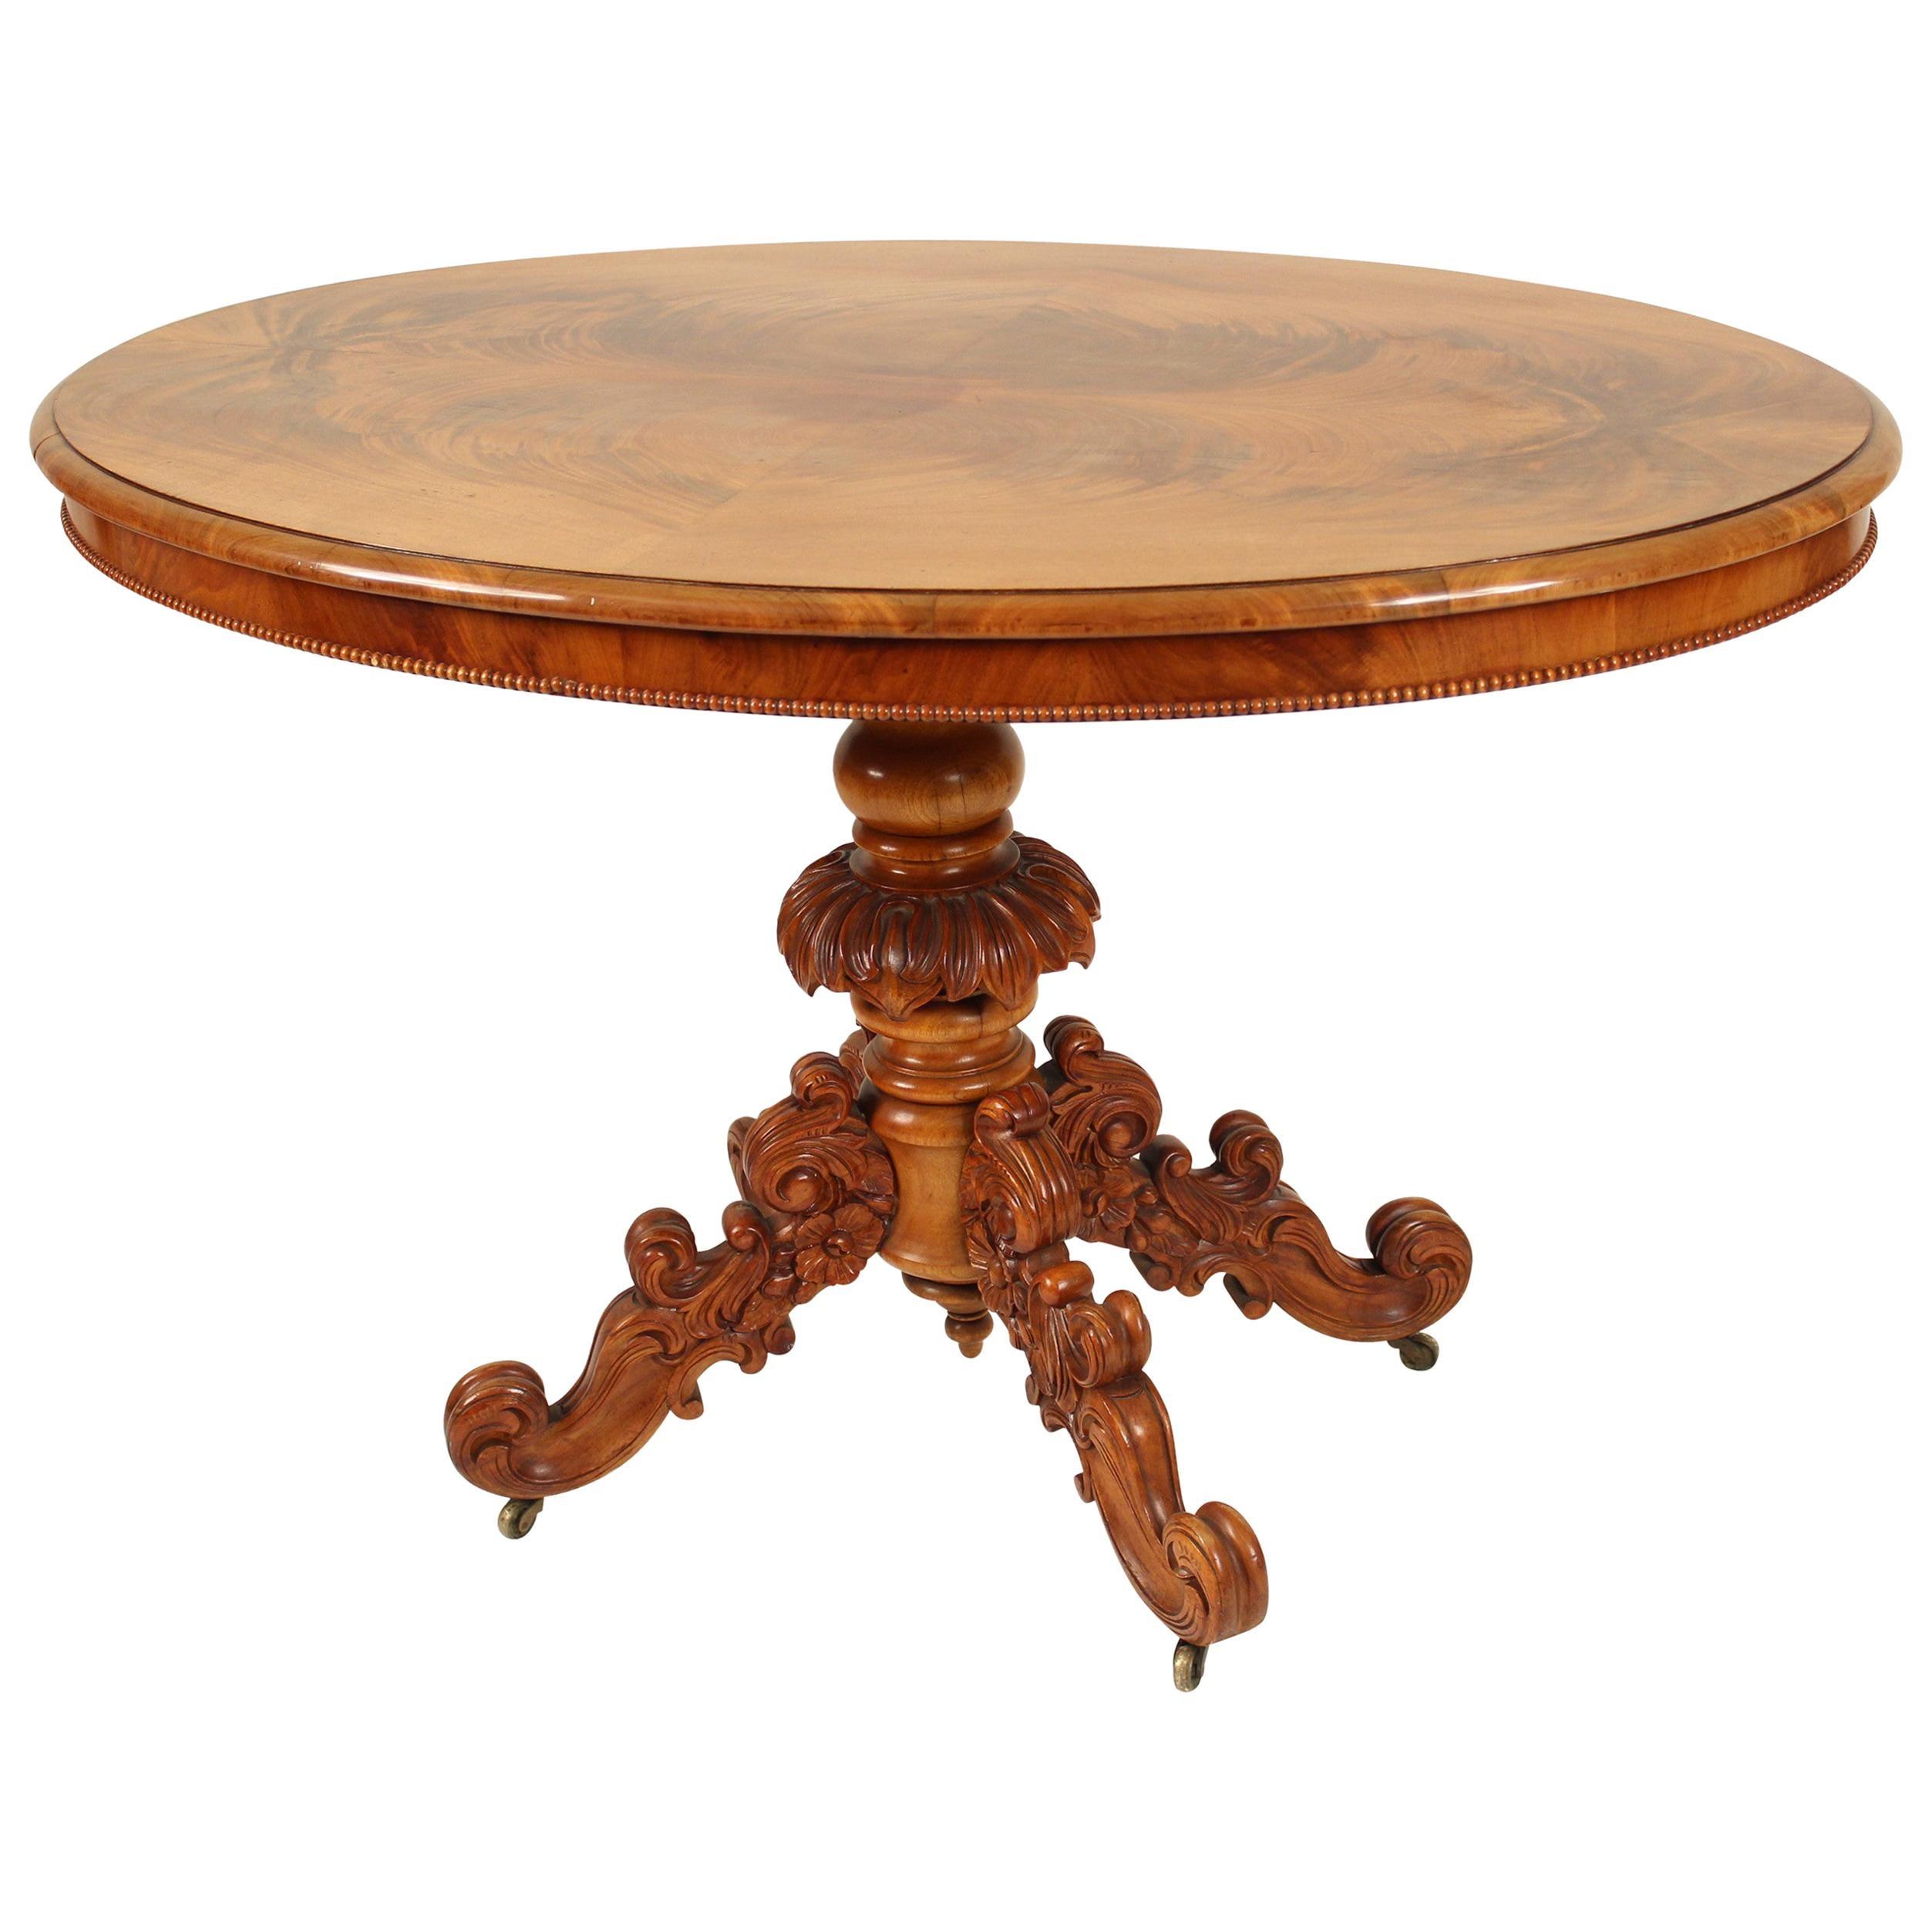 English Loo Table with Flame Mahogany Top